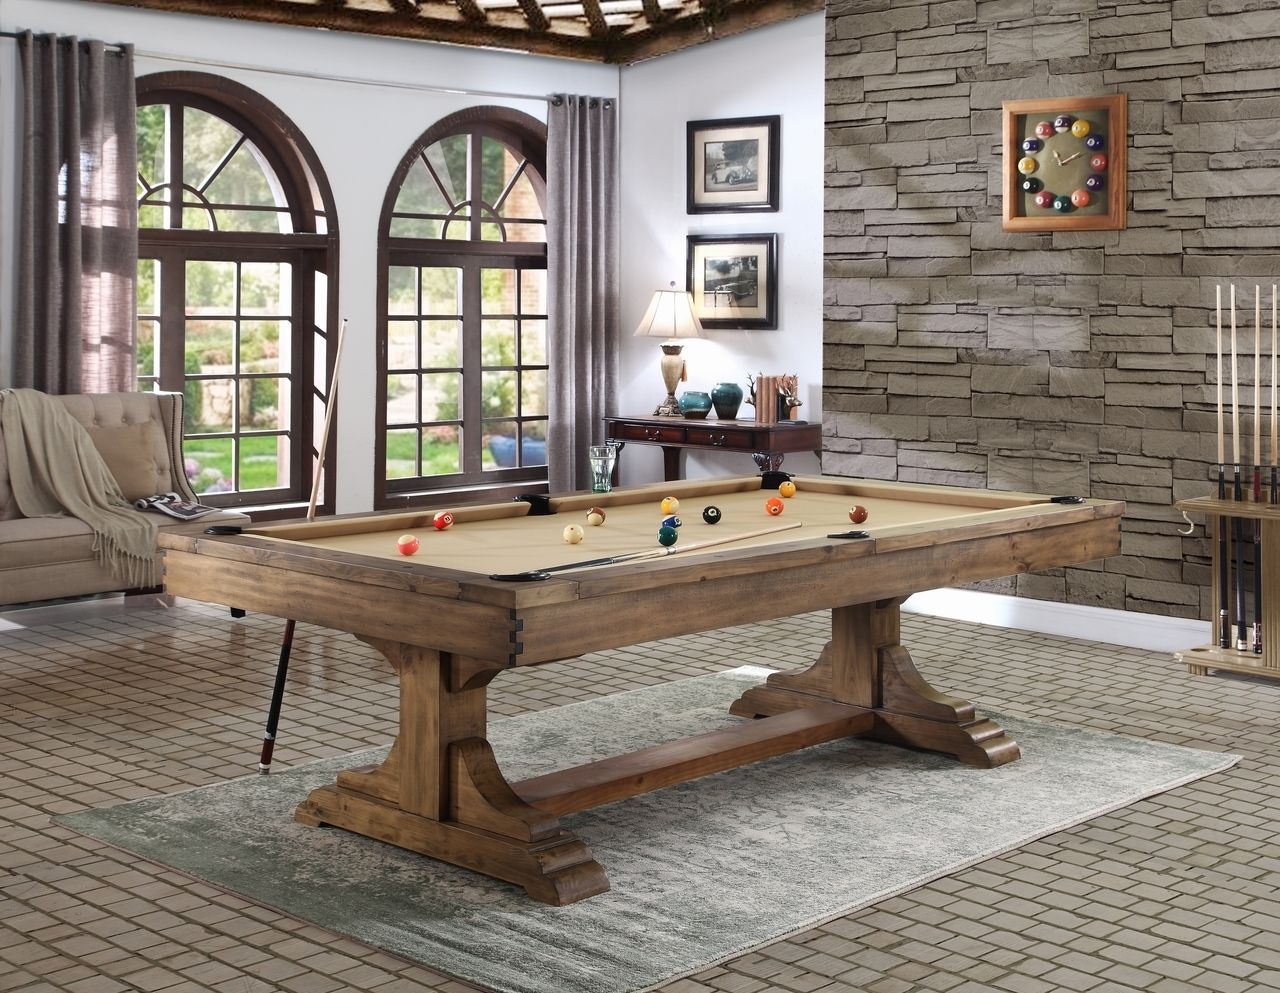 Dallas 8 foot pool table antique honey pool table room